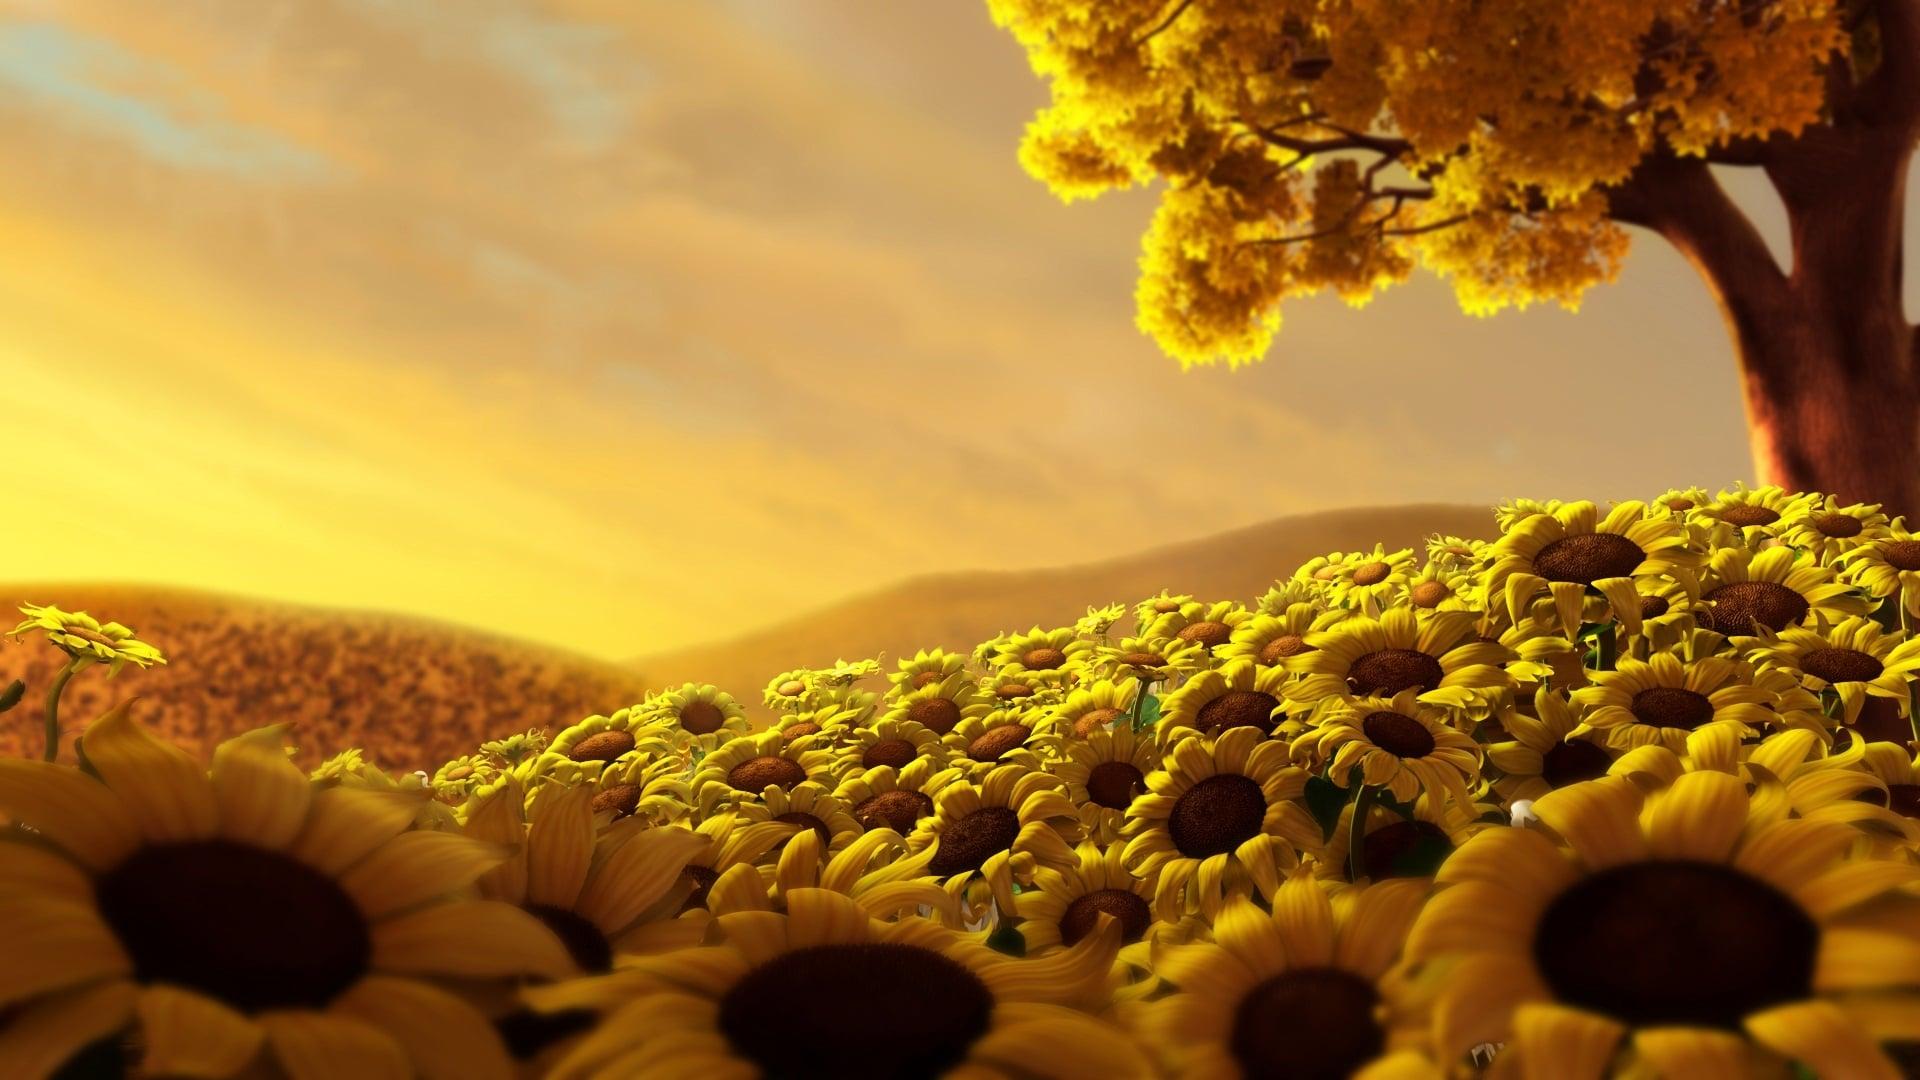 Sunflower Landscapes